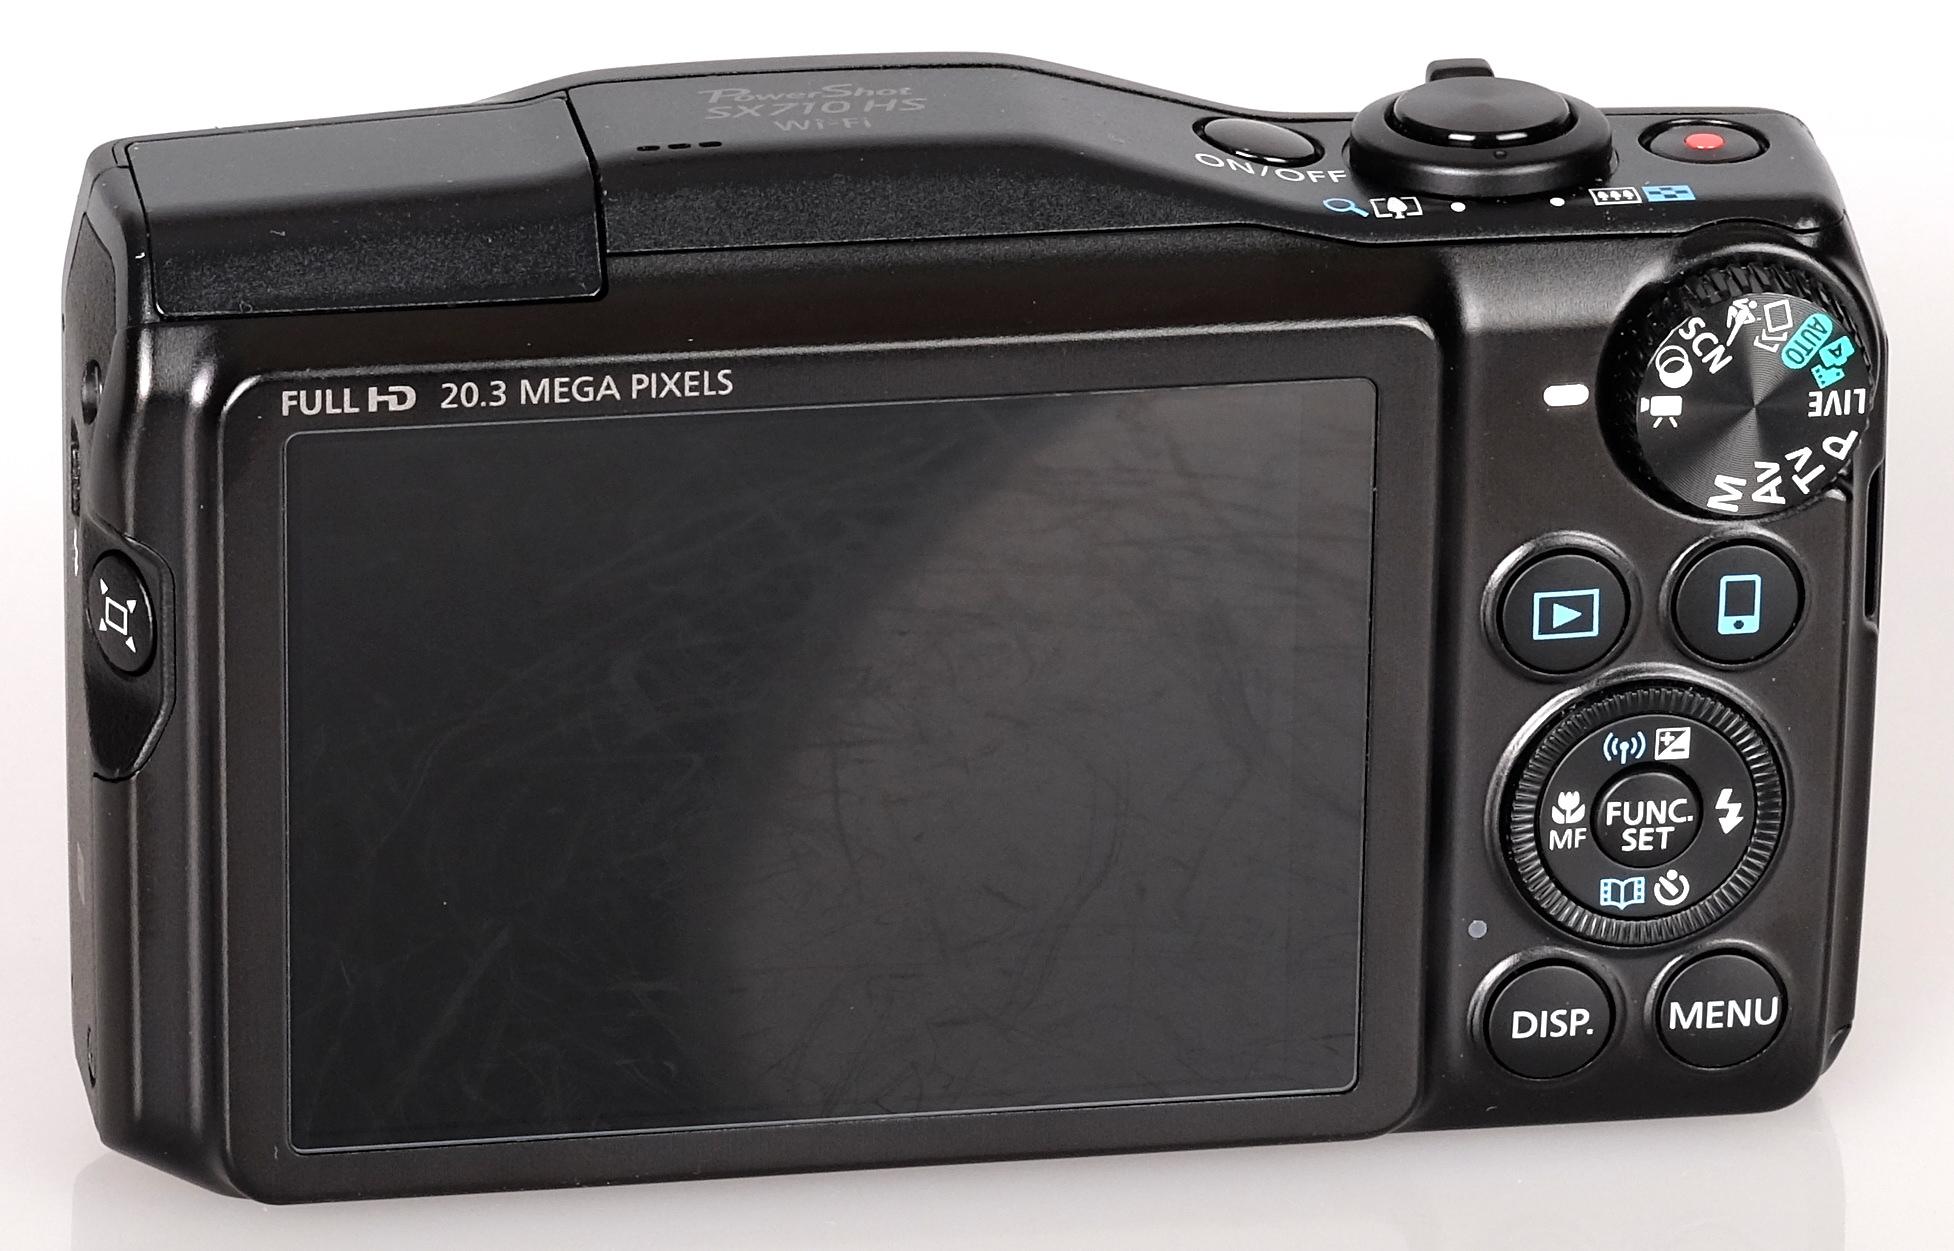 Amusing Res Canon Powershot Sx710 Black 6 1422377210 Canon Powershot Sx710 Hs Manual Canon Powershot Sx710 Hs Sample Images dpreview Canon Powershot Sx710